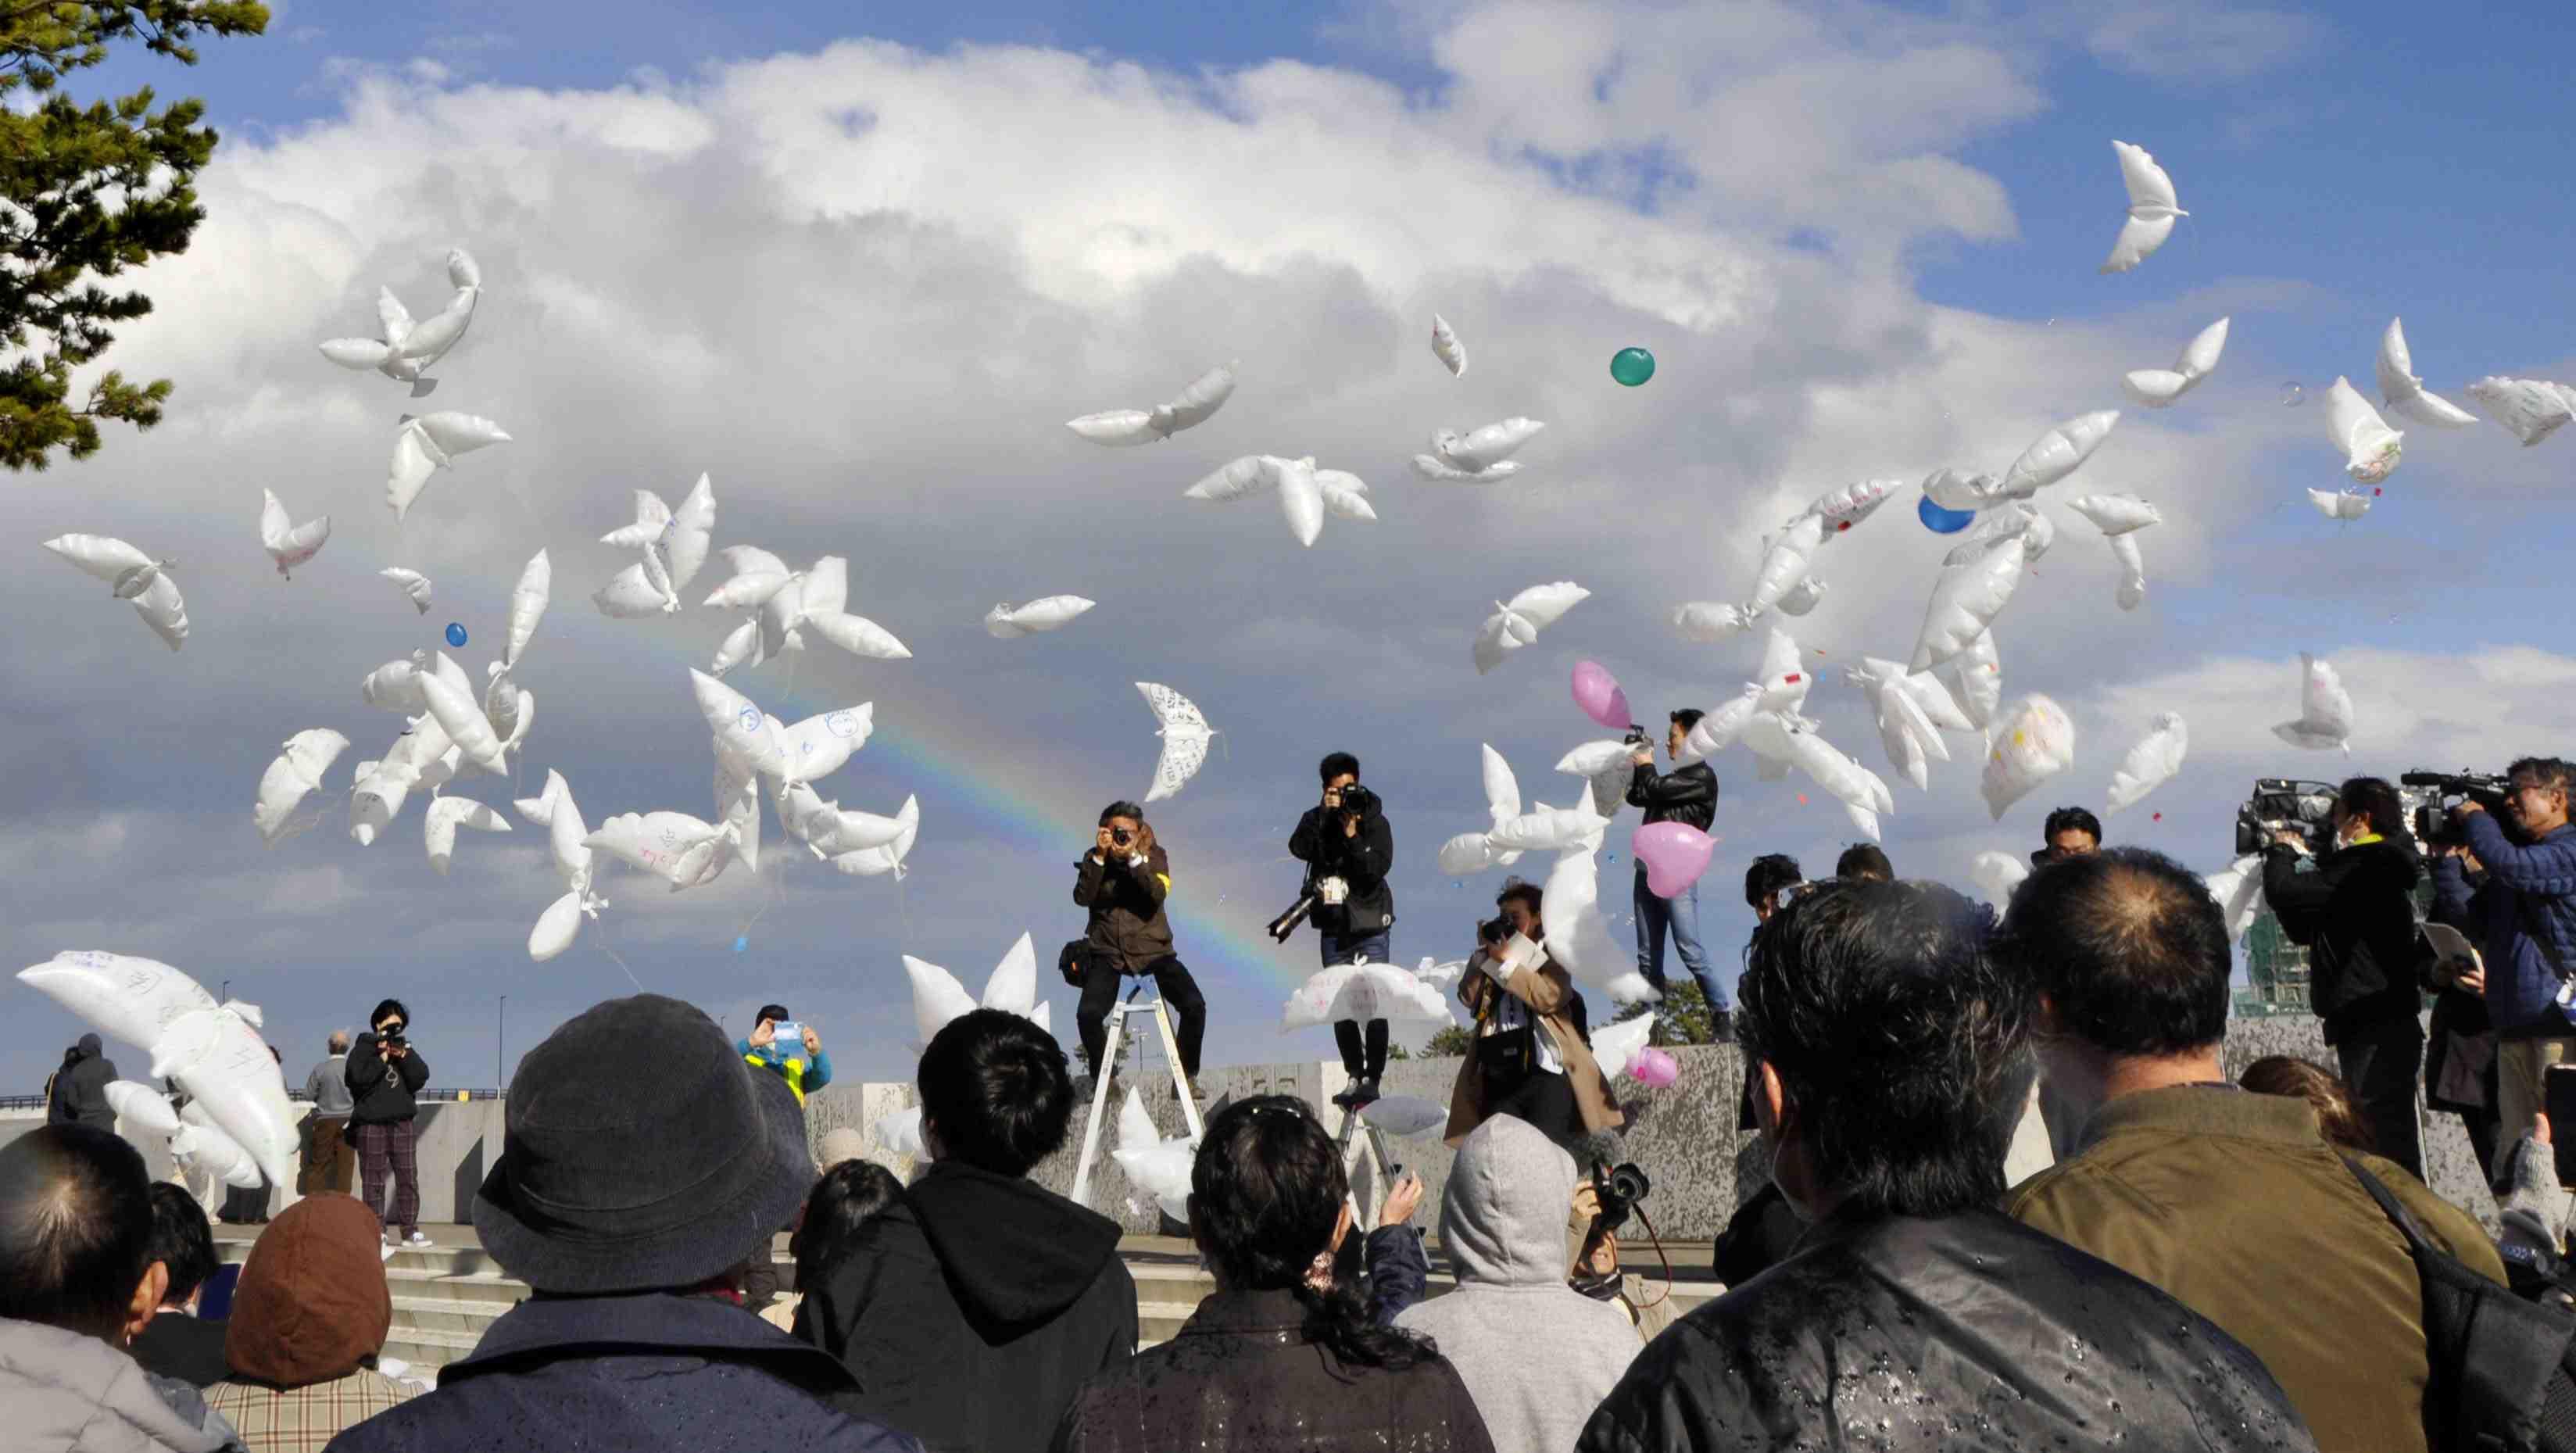 Japan 3.11 Anniversary The Great Tohoku Earthquake 049